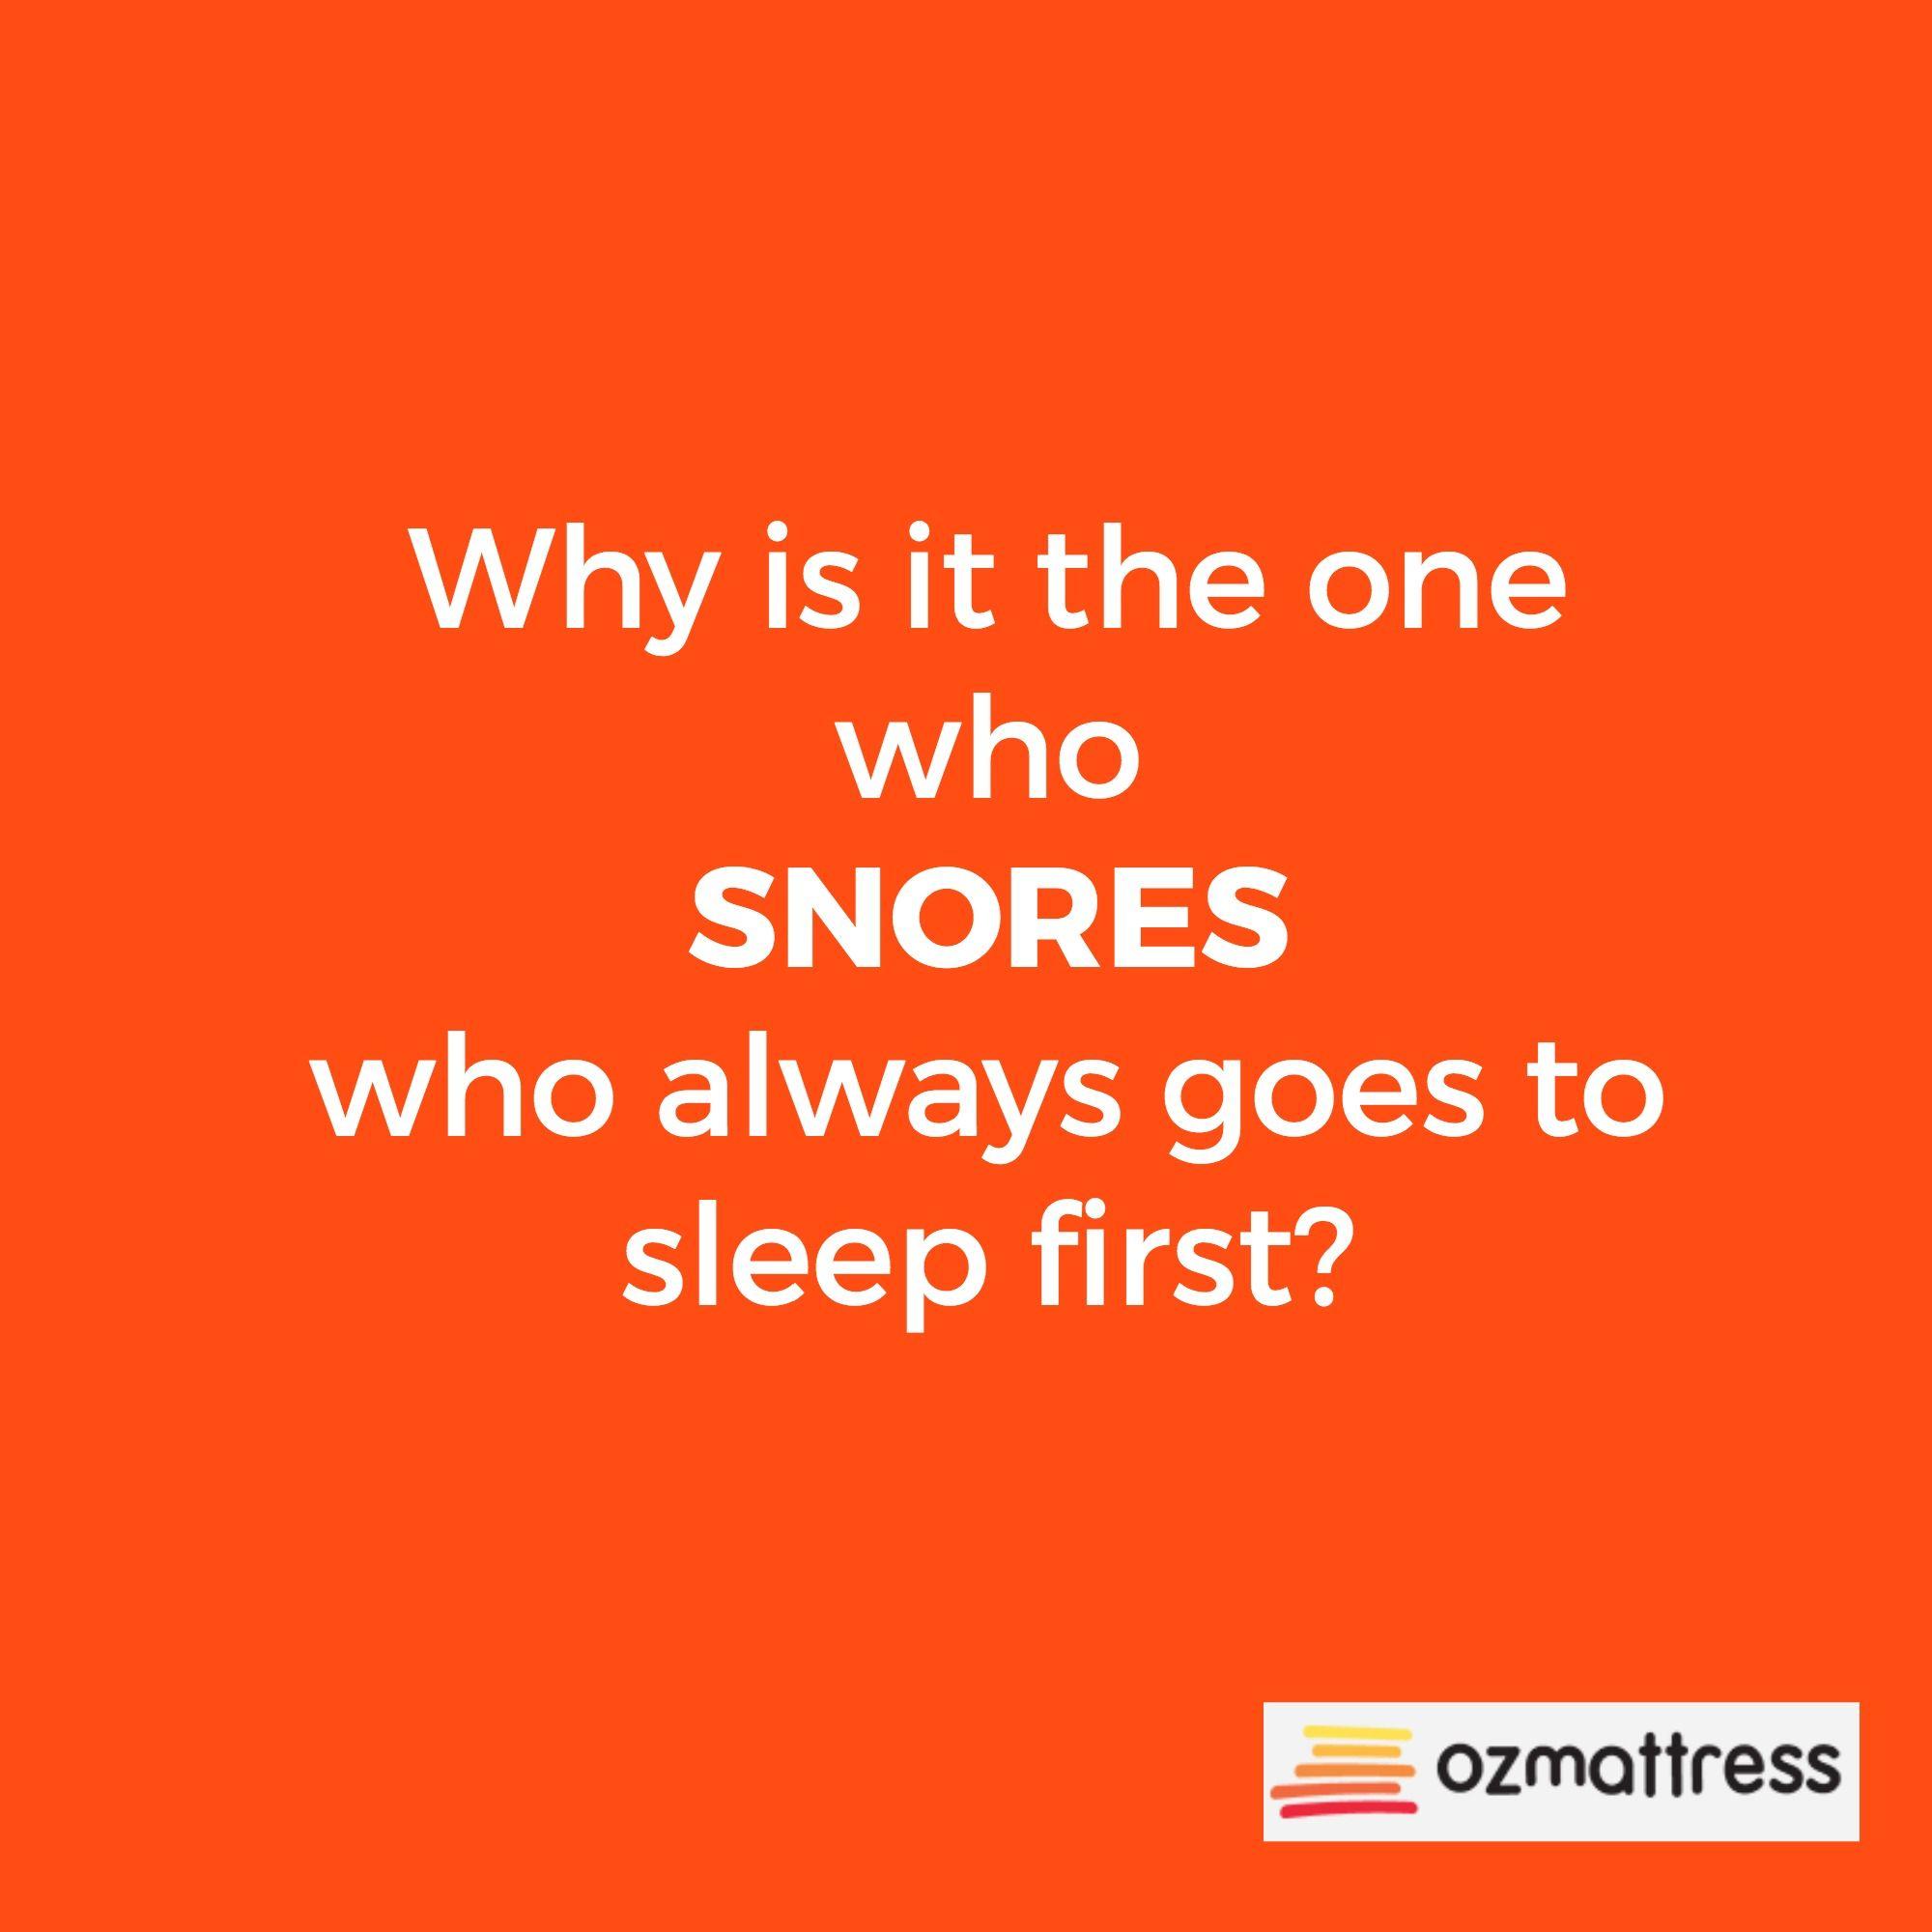 Ozmattress Sleep Snore Snorer Snoring Sleeping Words Go To Sleep Snoring